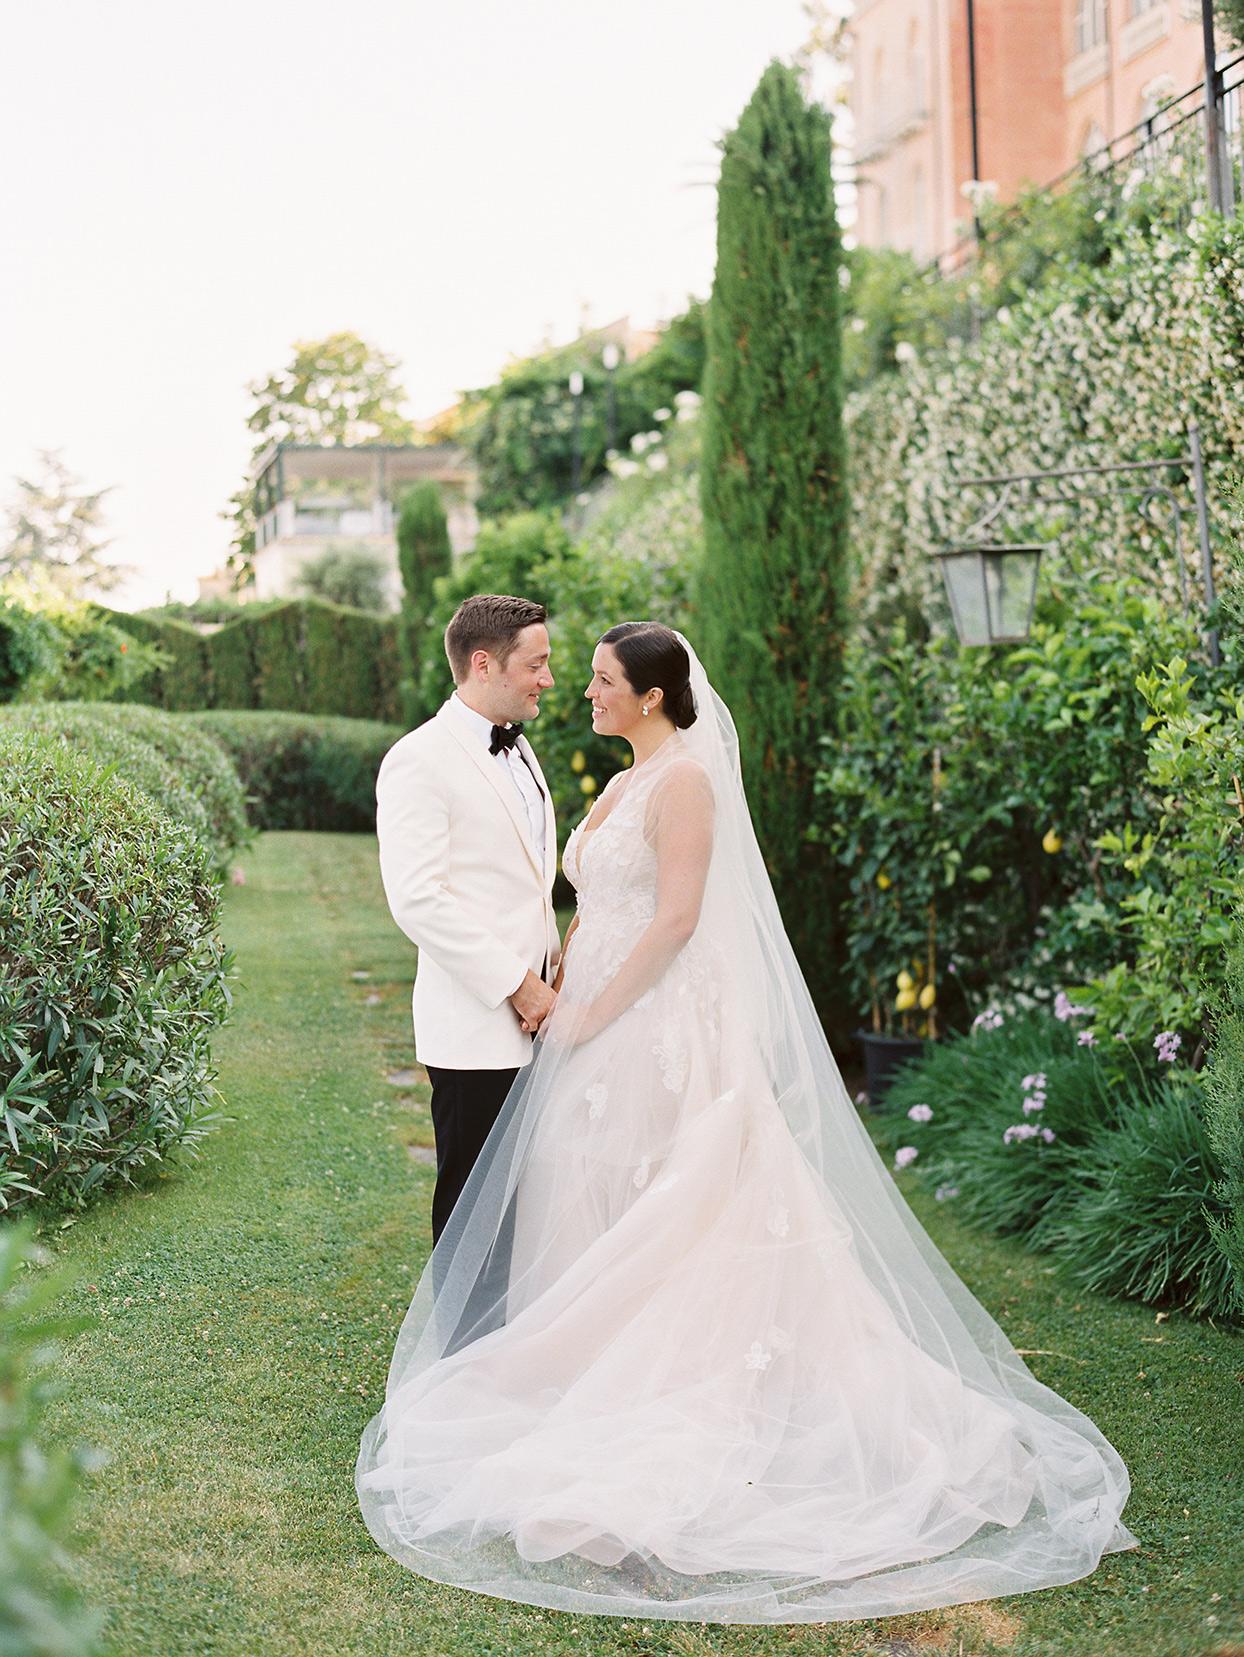 jacqueline david wedding couple in garden